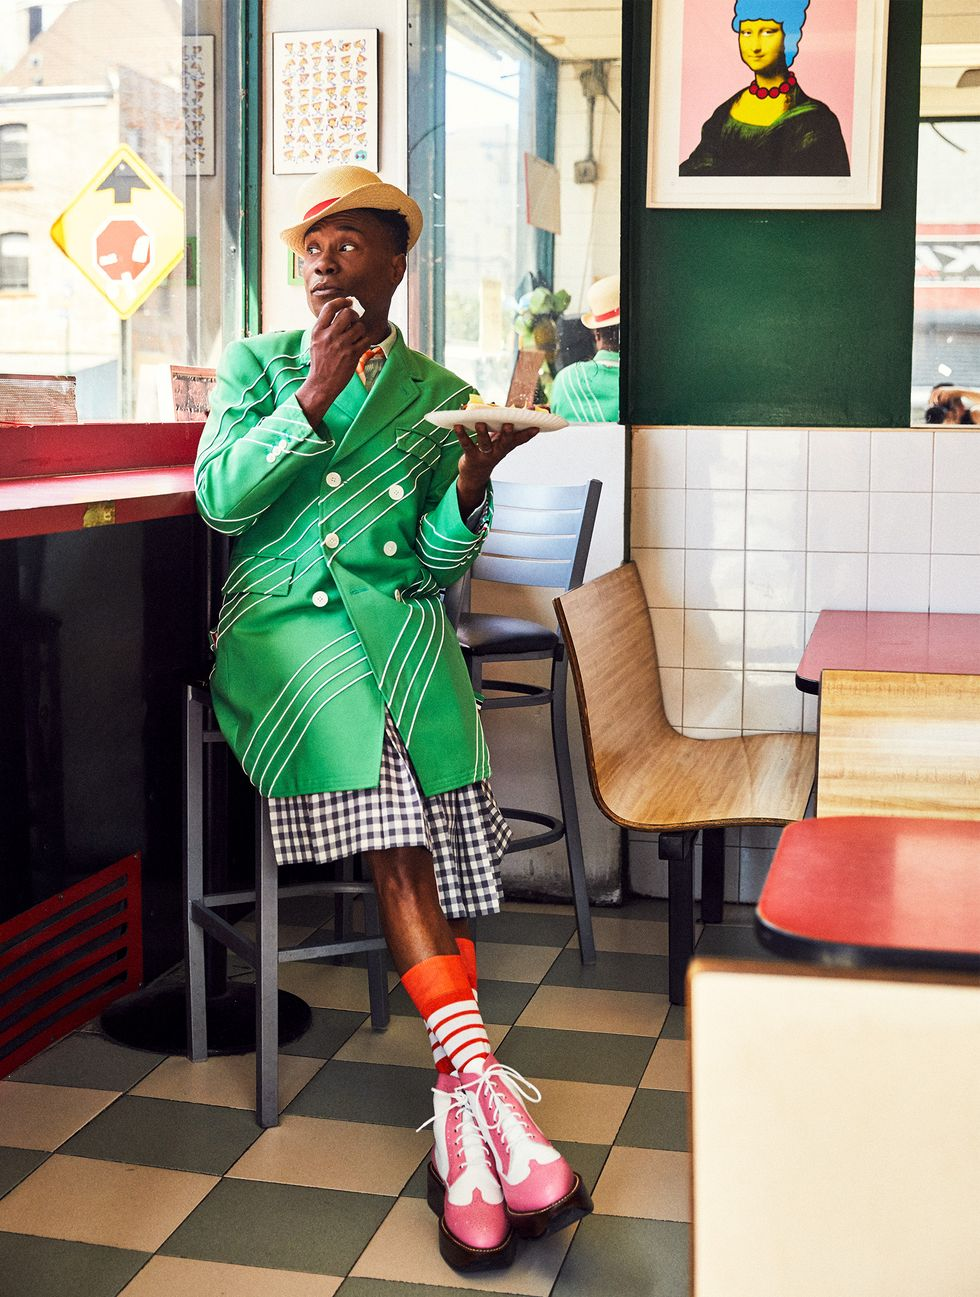 Одежда, носки, шляпа, обувь, все — Thom Browne